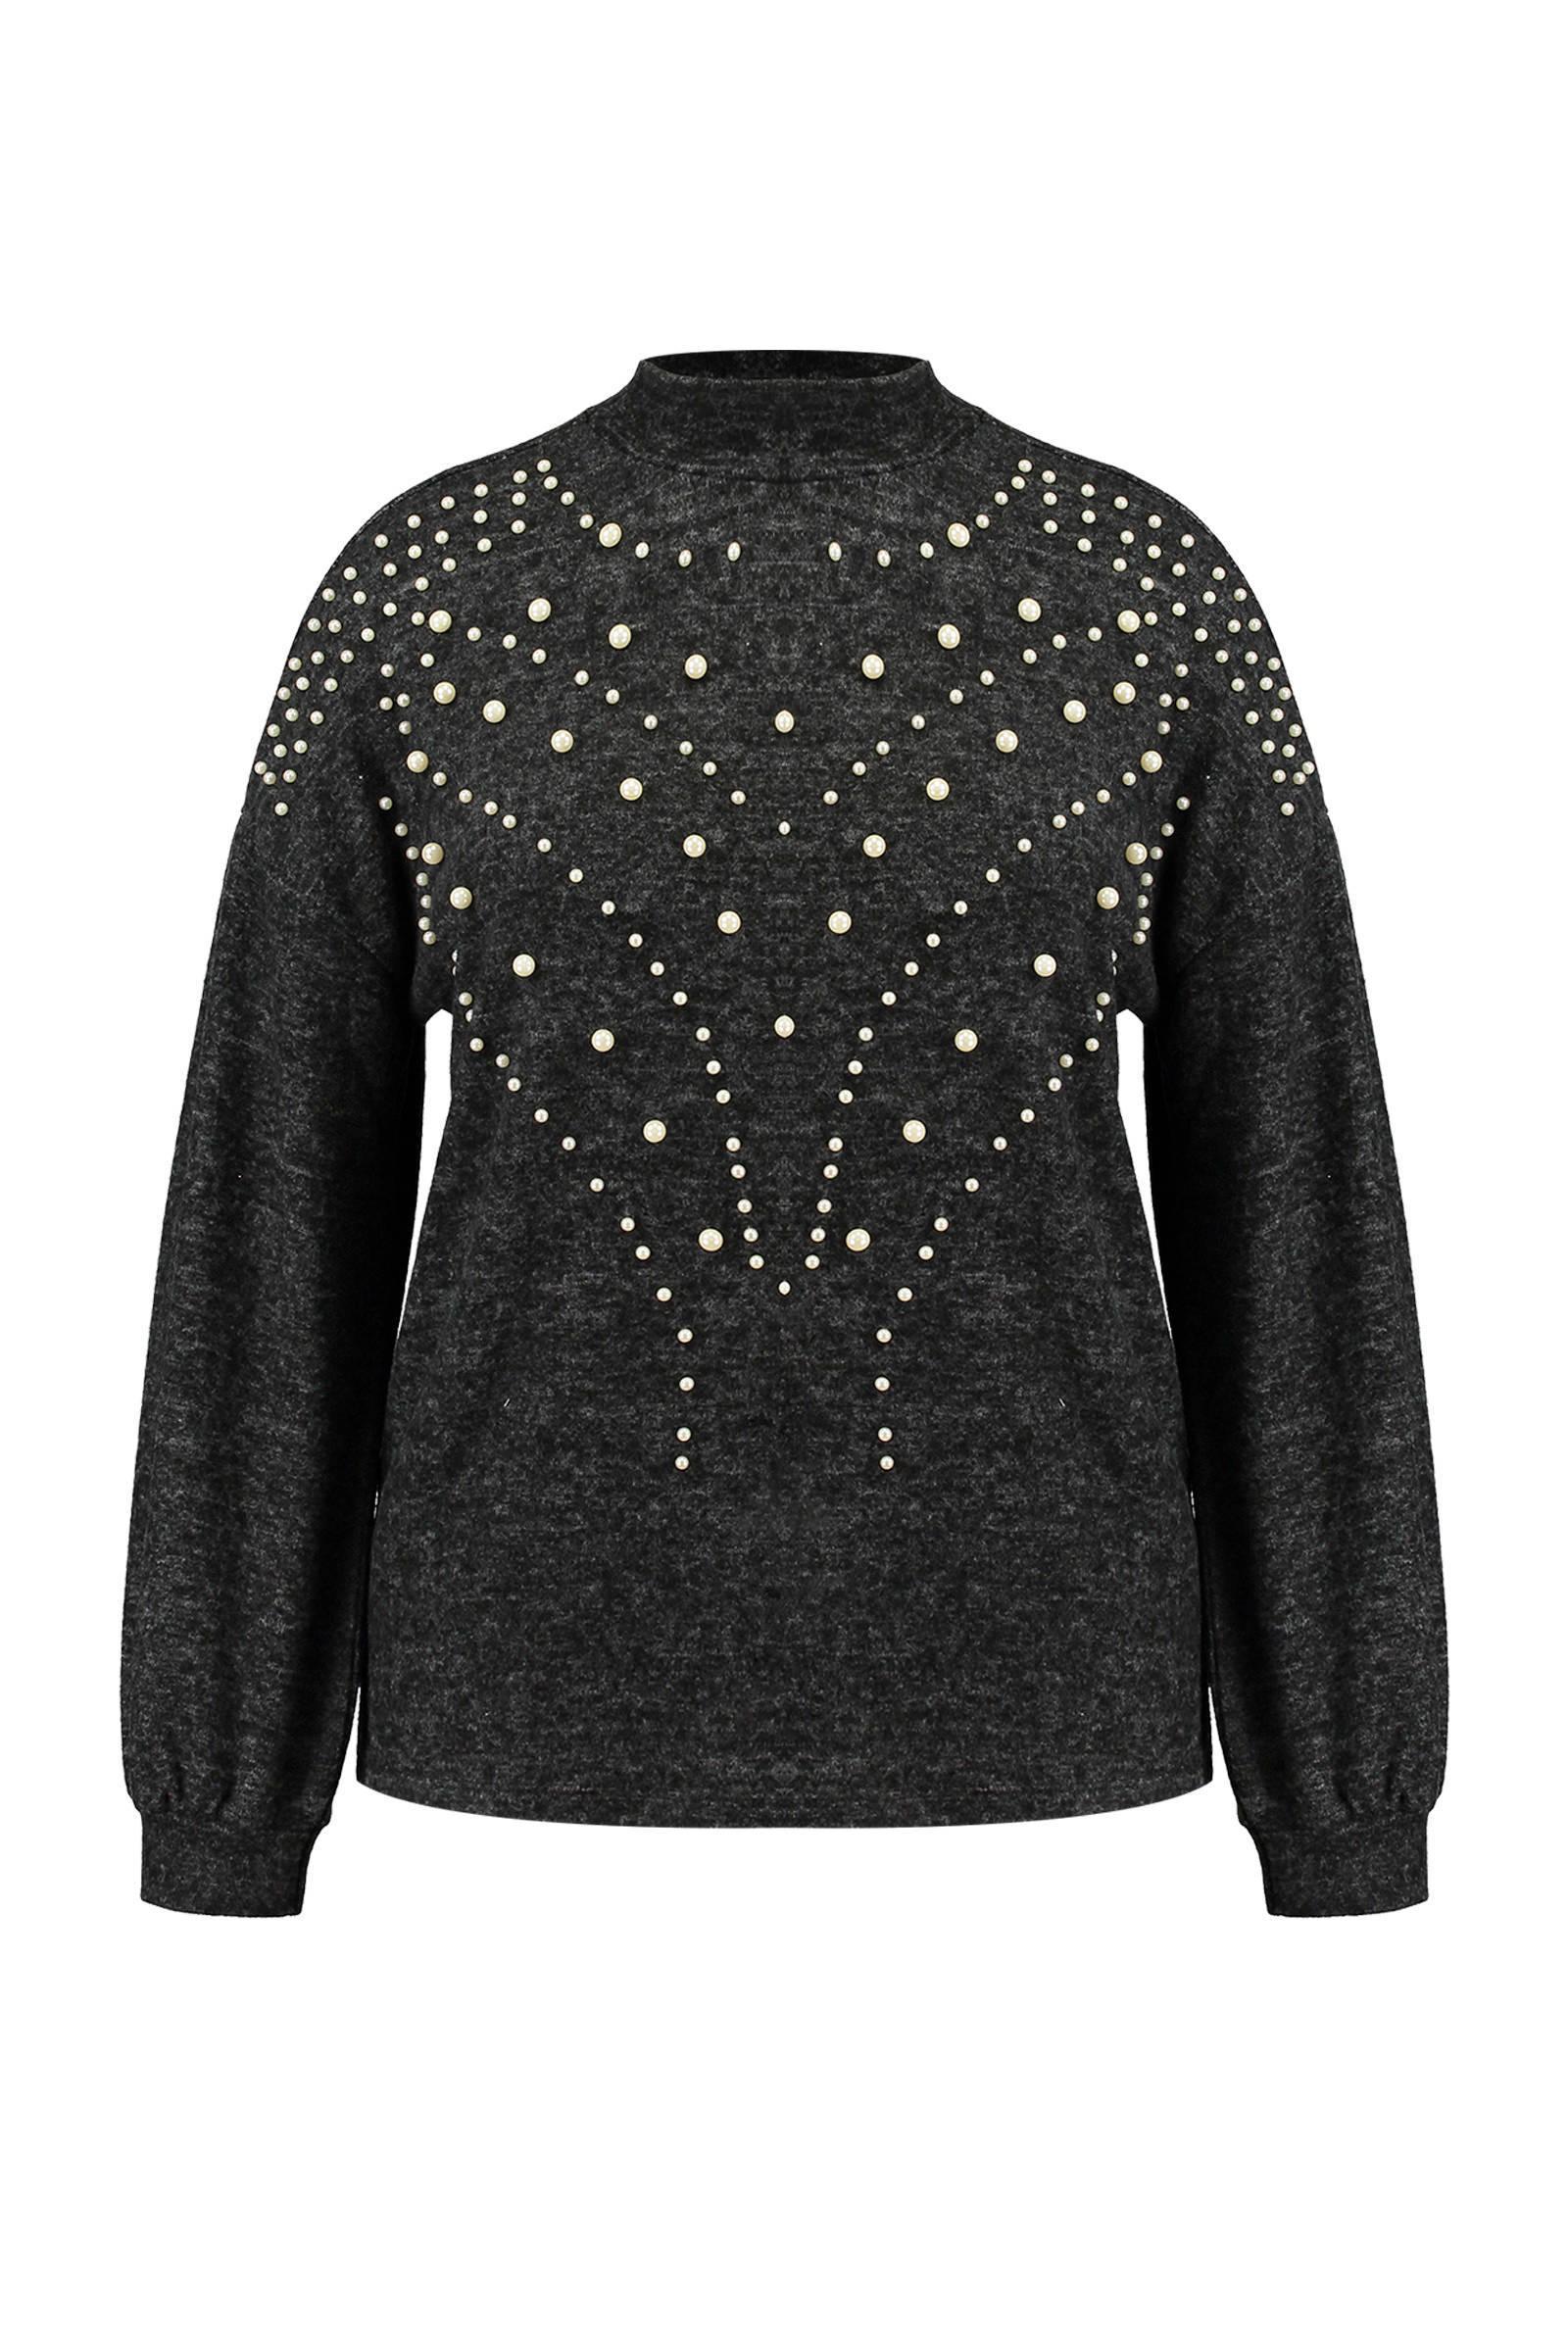 MS Mode gemêleerde trui met parels antraciet (dames)